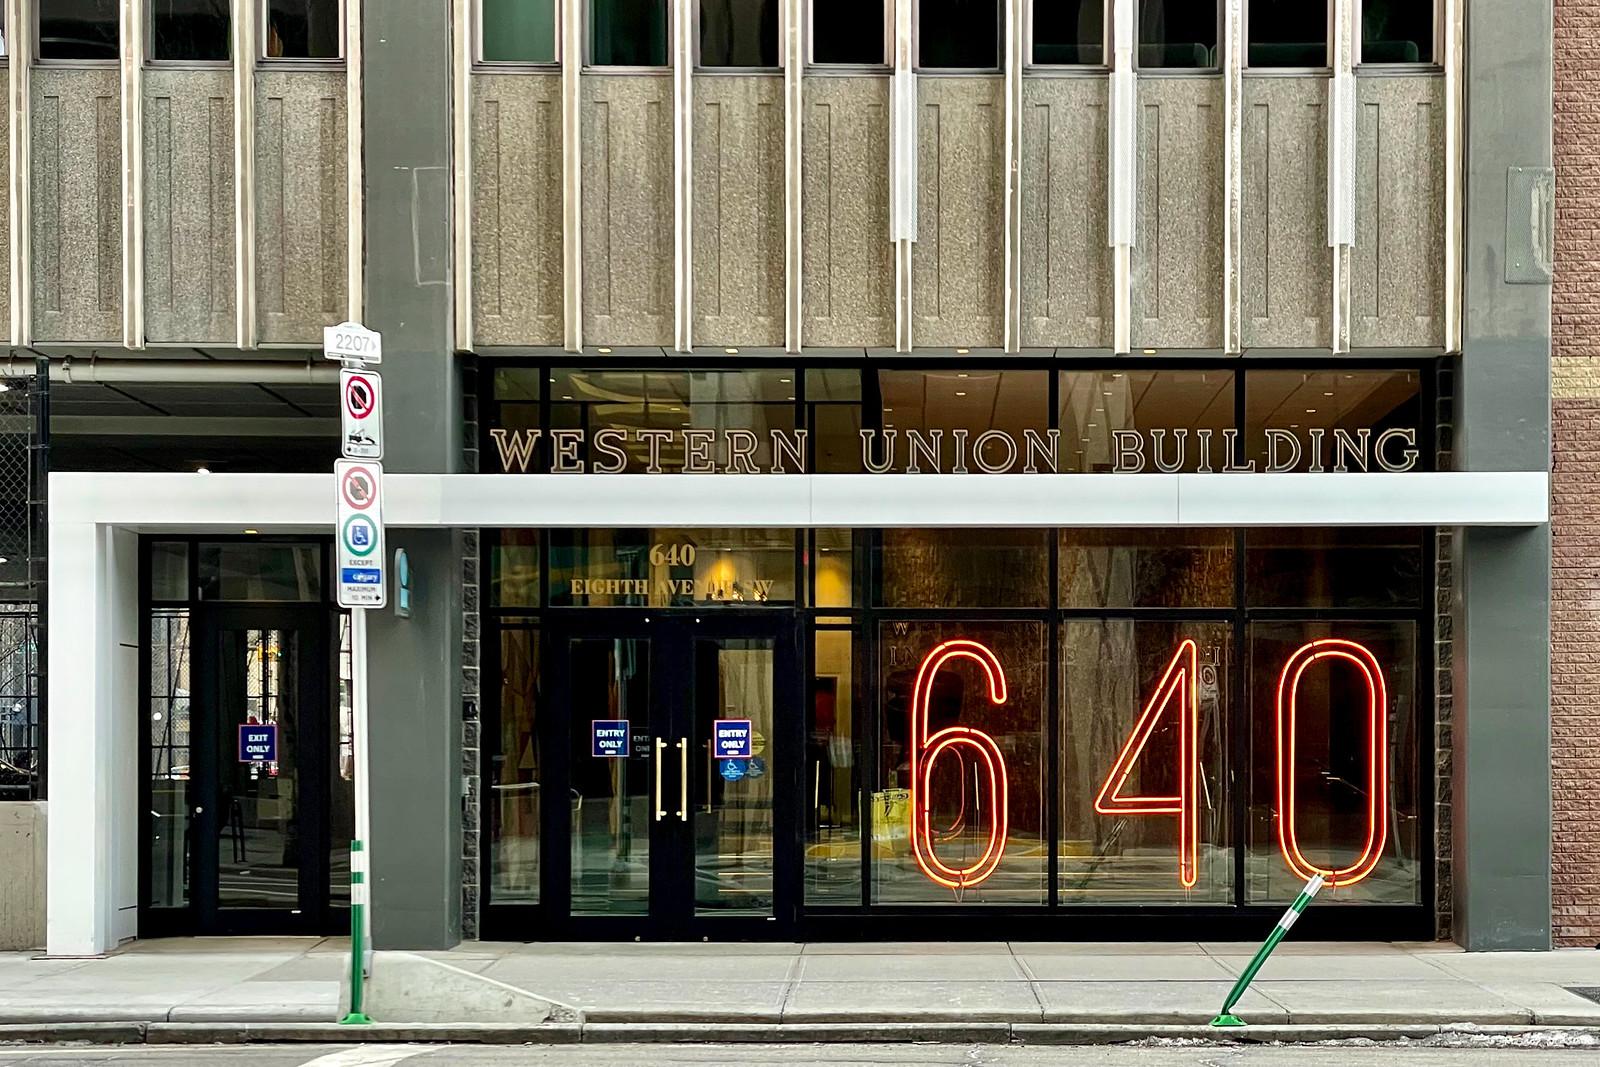 Western Union Building